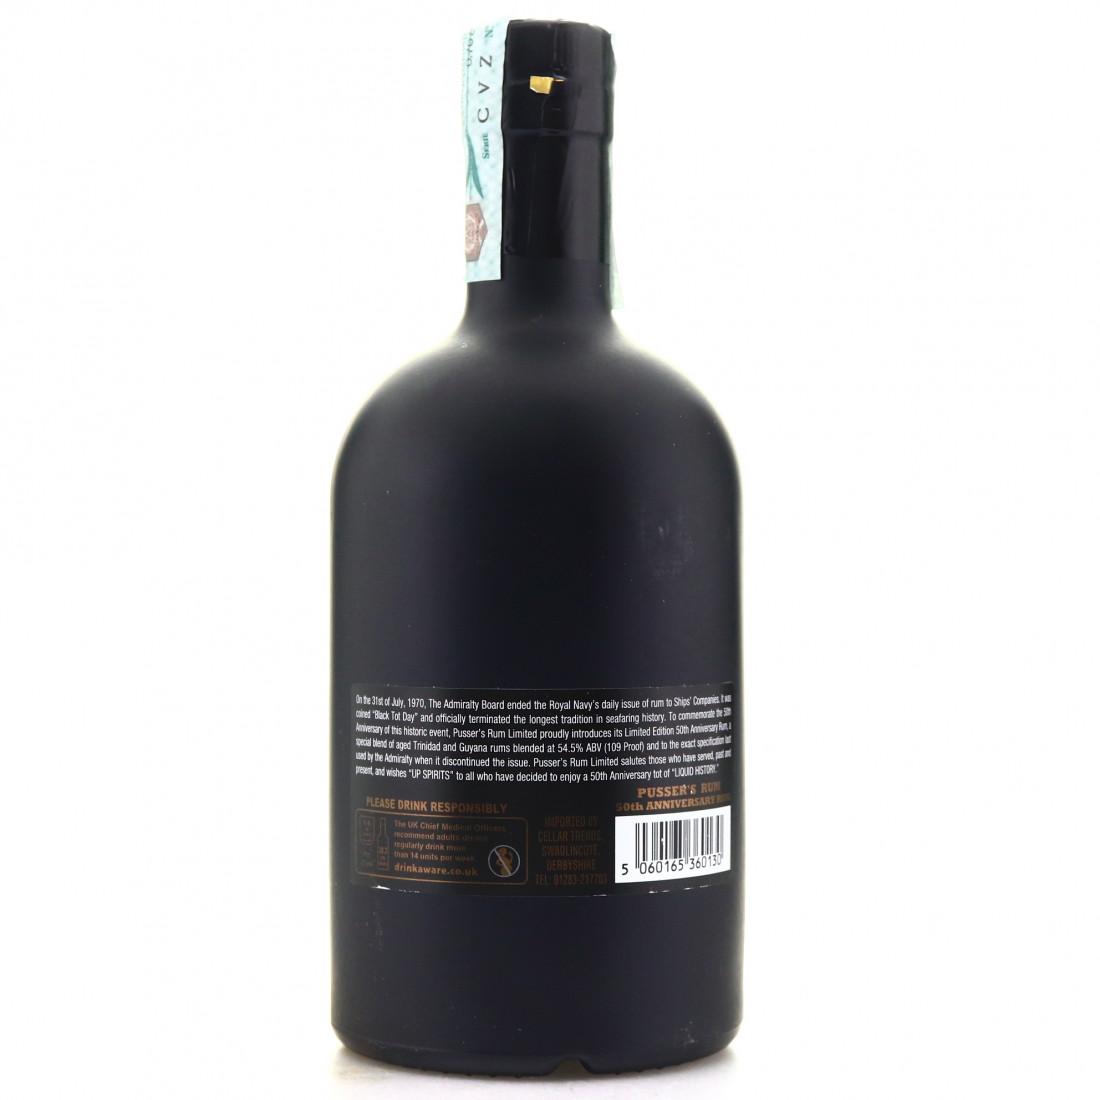 Pusser's British Navy Rum Black Tot Day 50th Anniversary